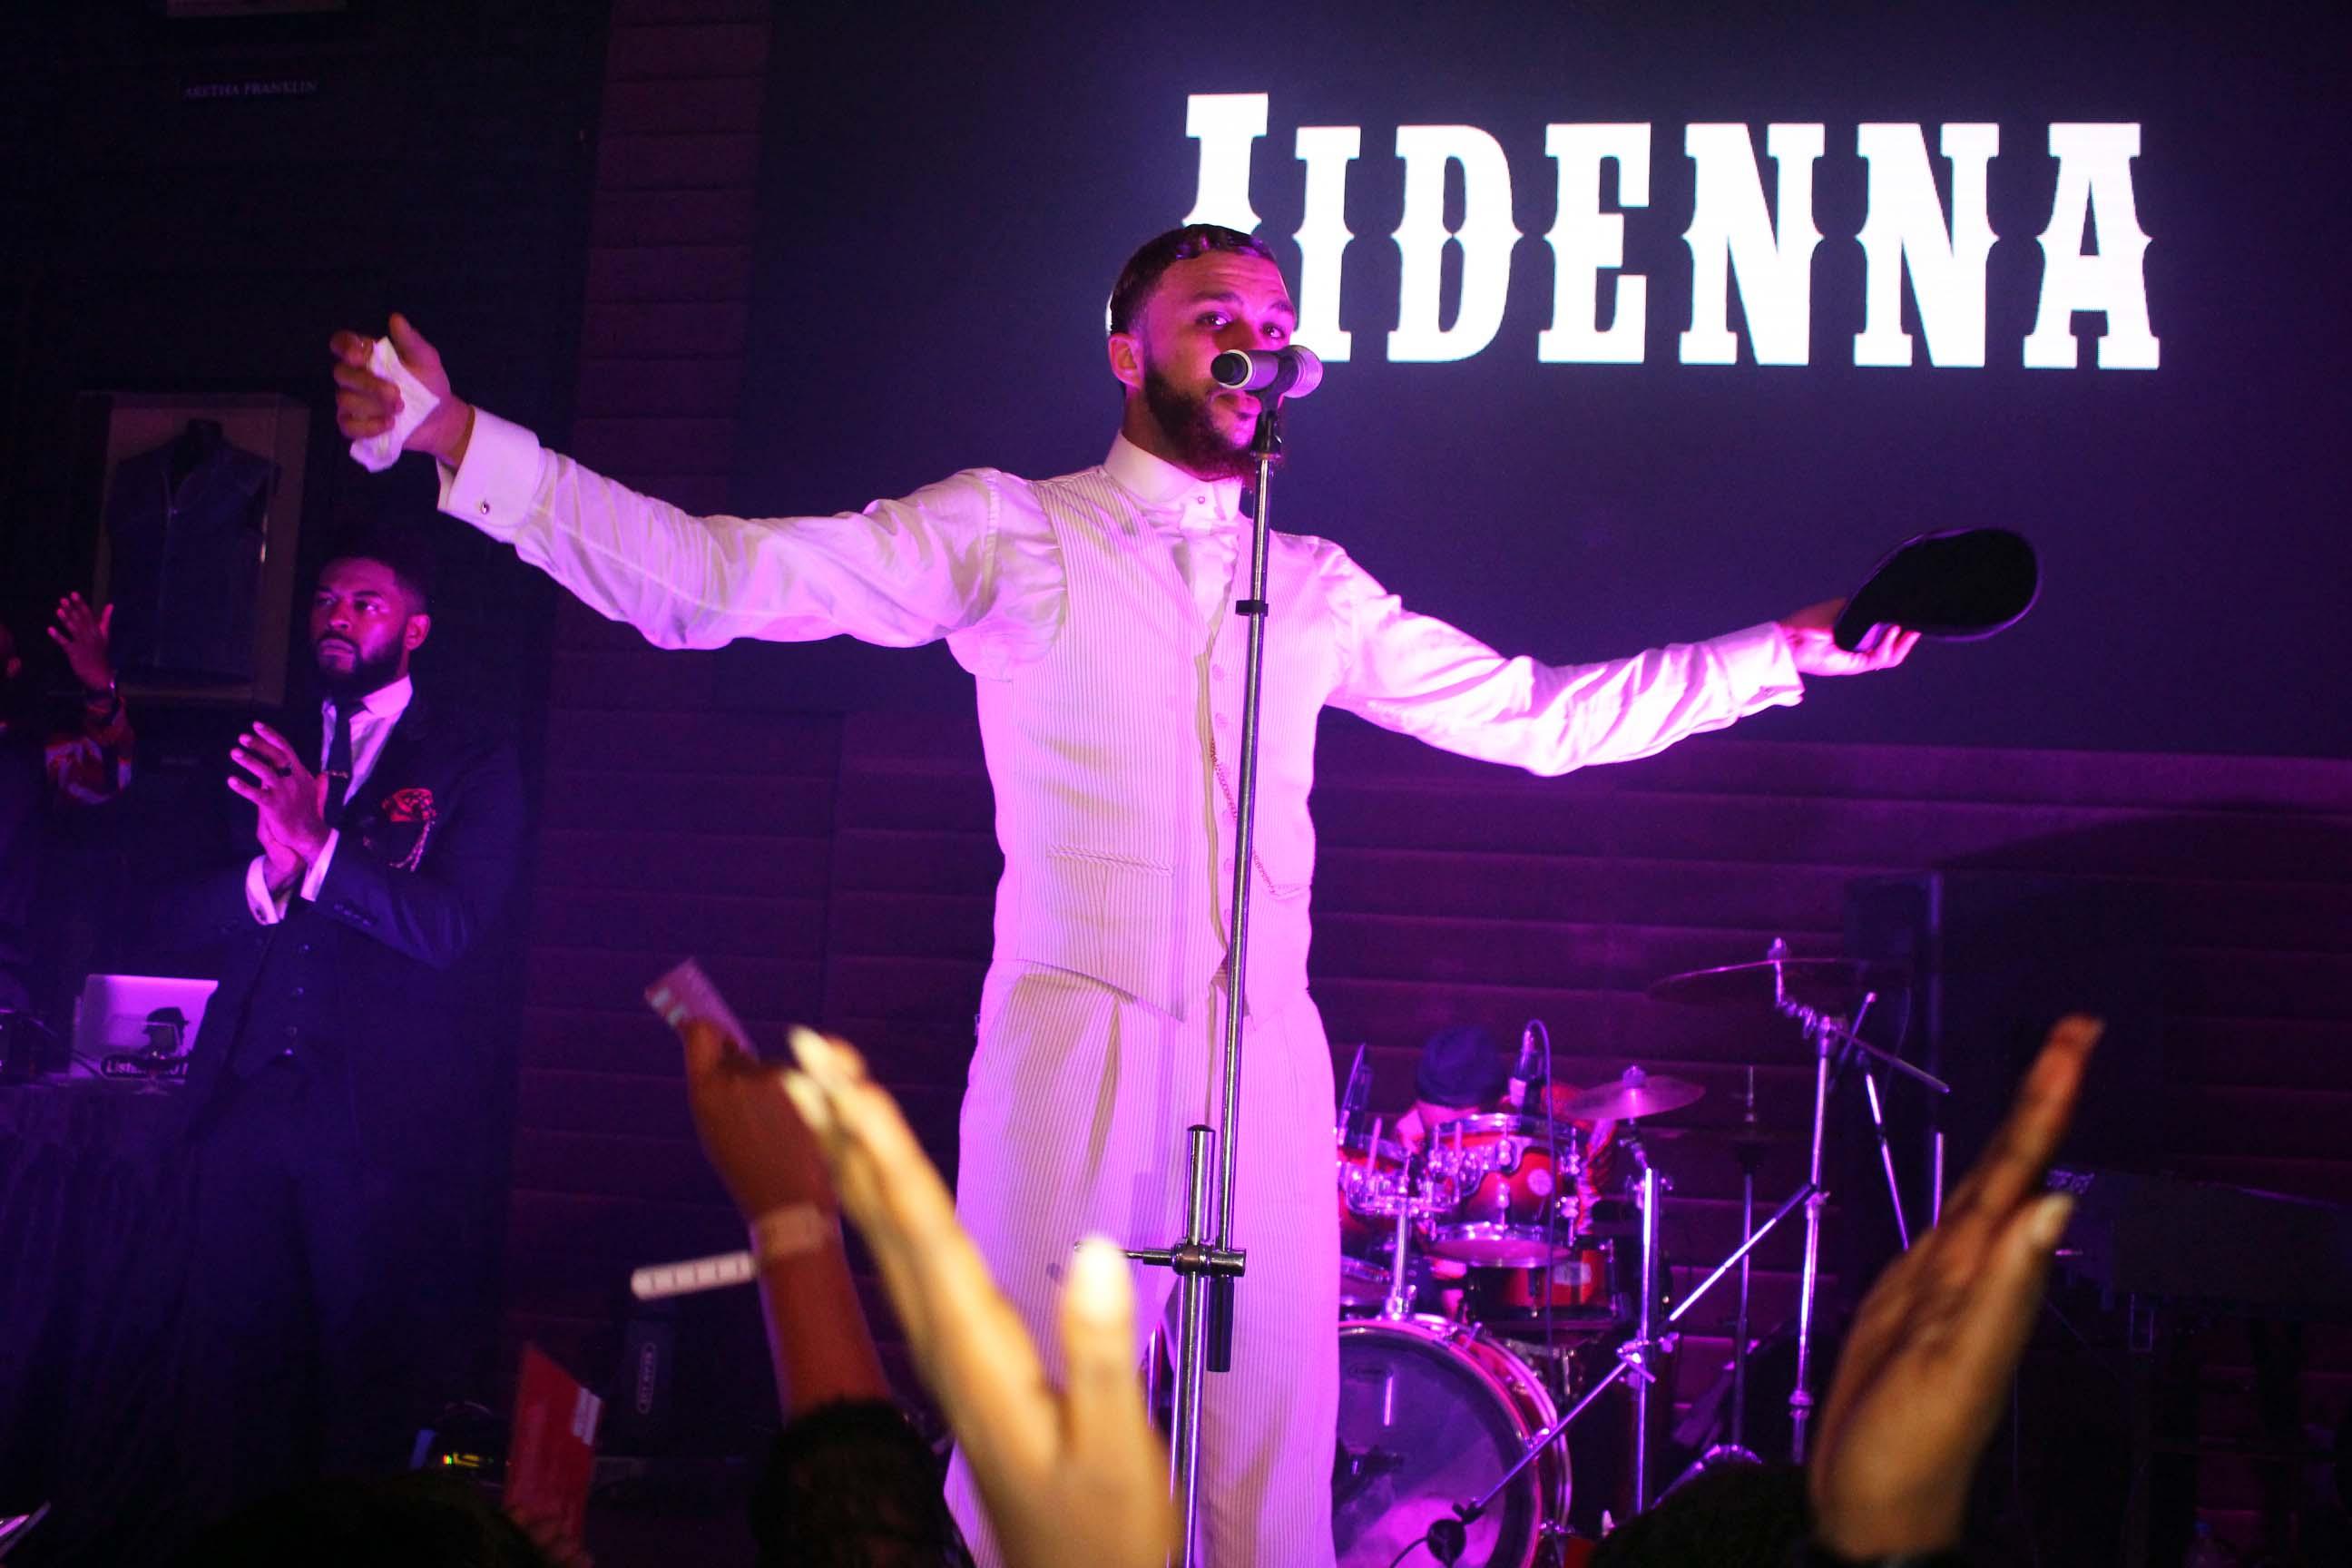 Jidenna Rocks At Hard Rock Cafe